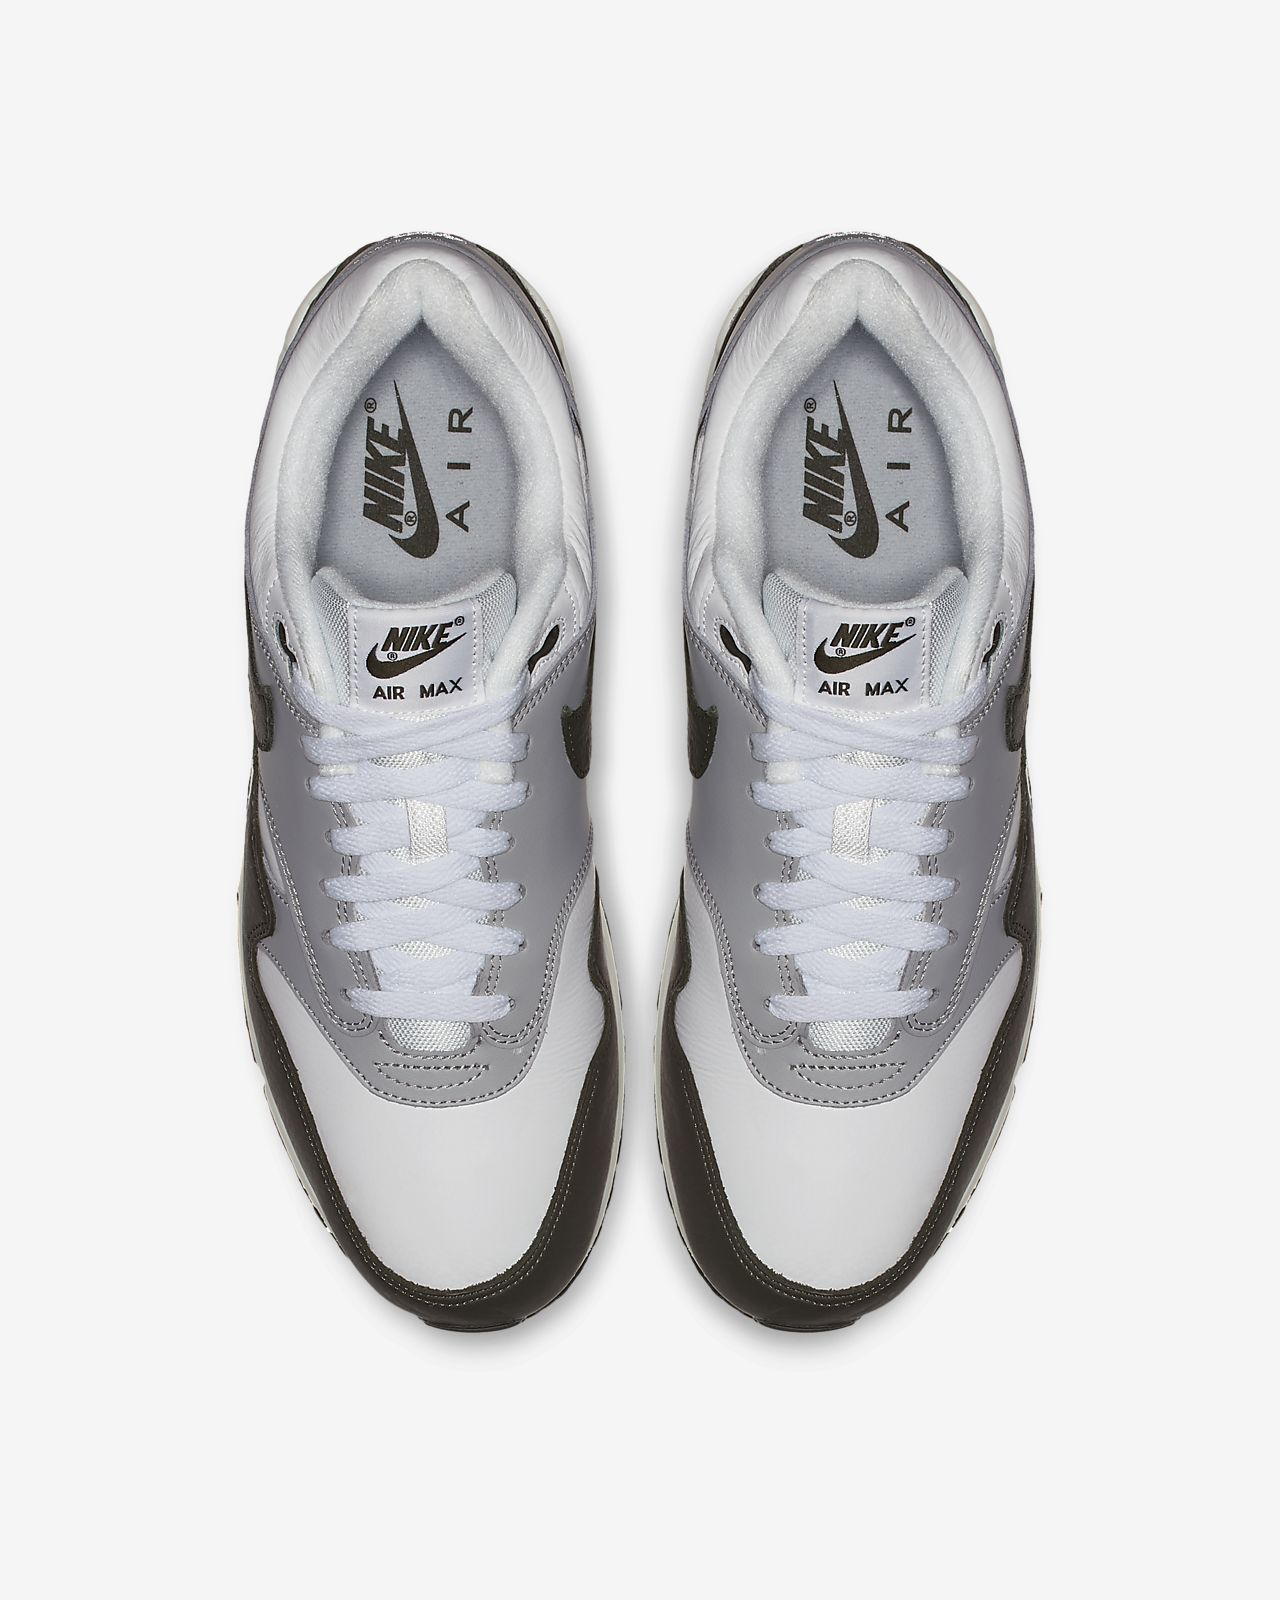 48210dfb736 Nike Air Max 90 1 Men s Shoe. Nike.com AU